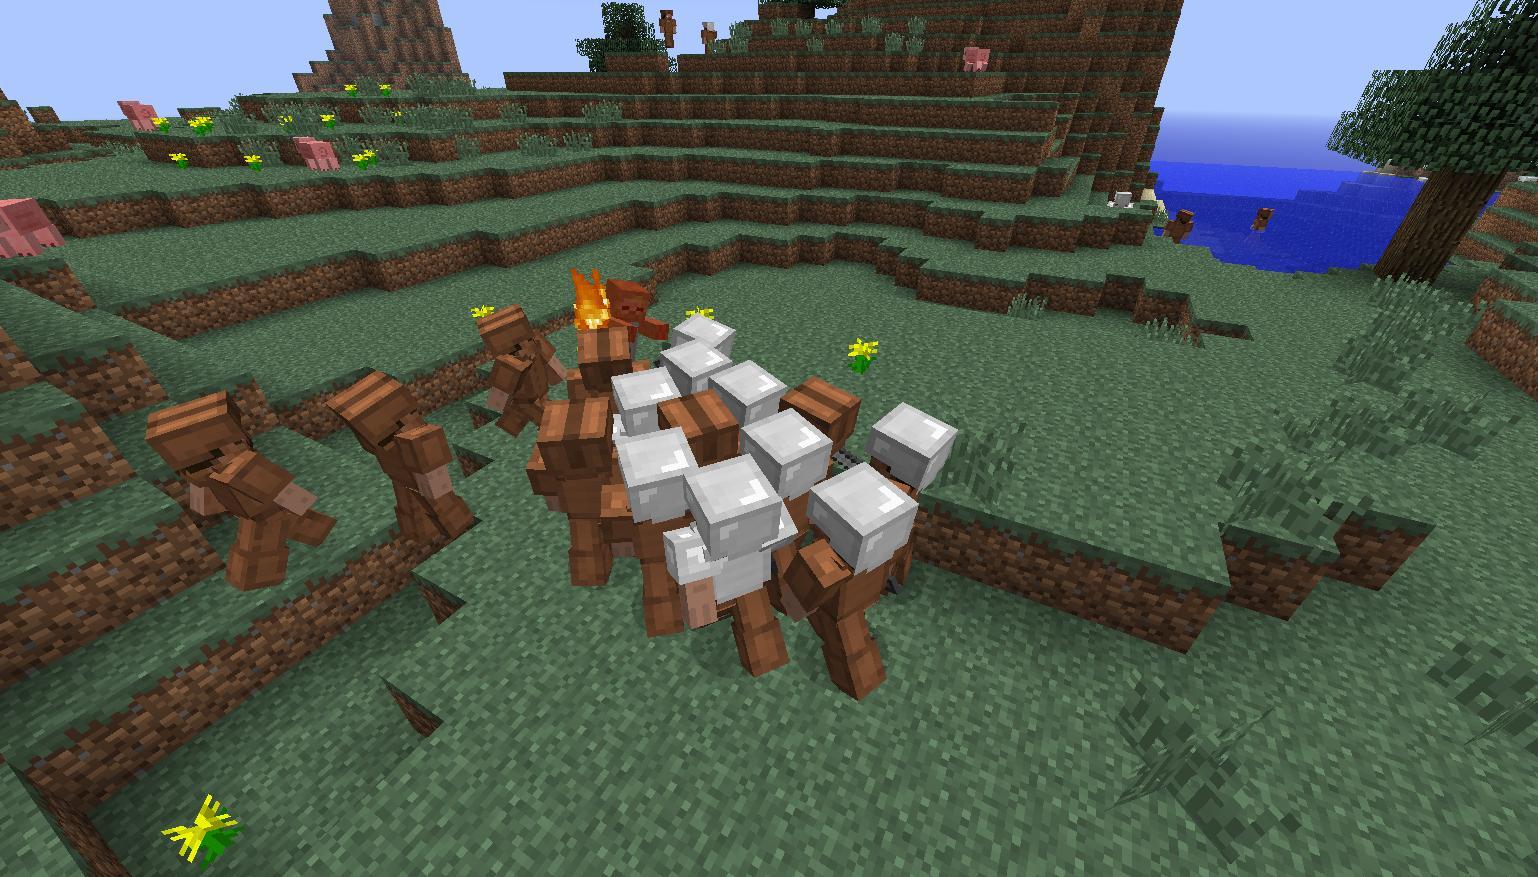 https://i0.wp.com/cdn.9pety.com/imgs/Mods/Defensive-Villagers-Mod-3.jpg?ssl=1